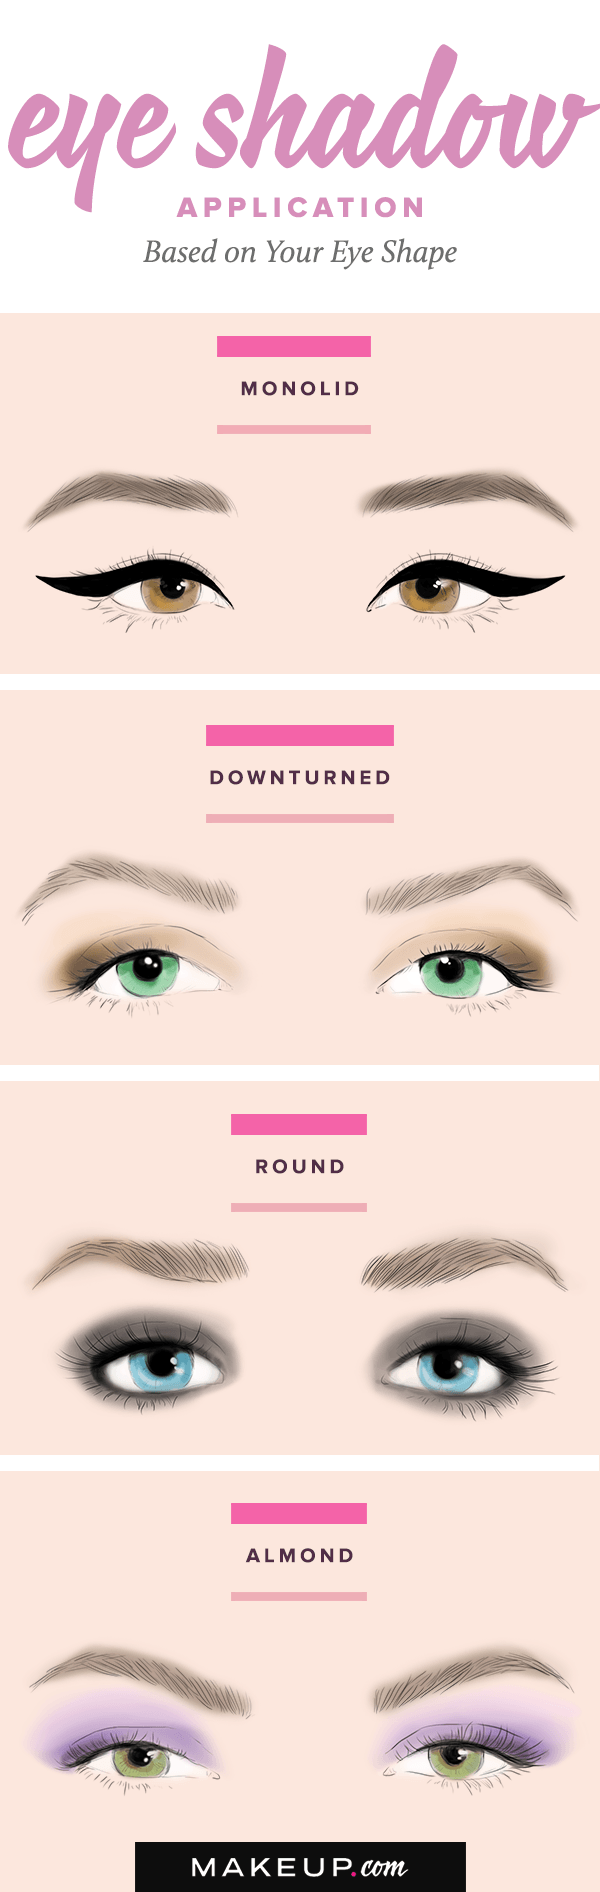 Eye Shadow Application Based on Your Eye Shape | Eye ...